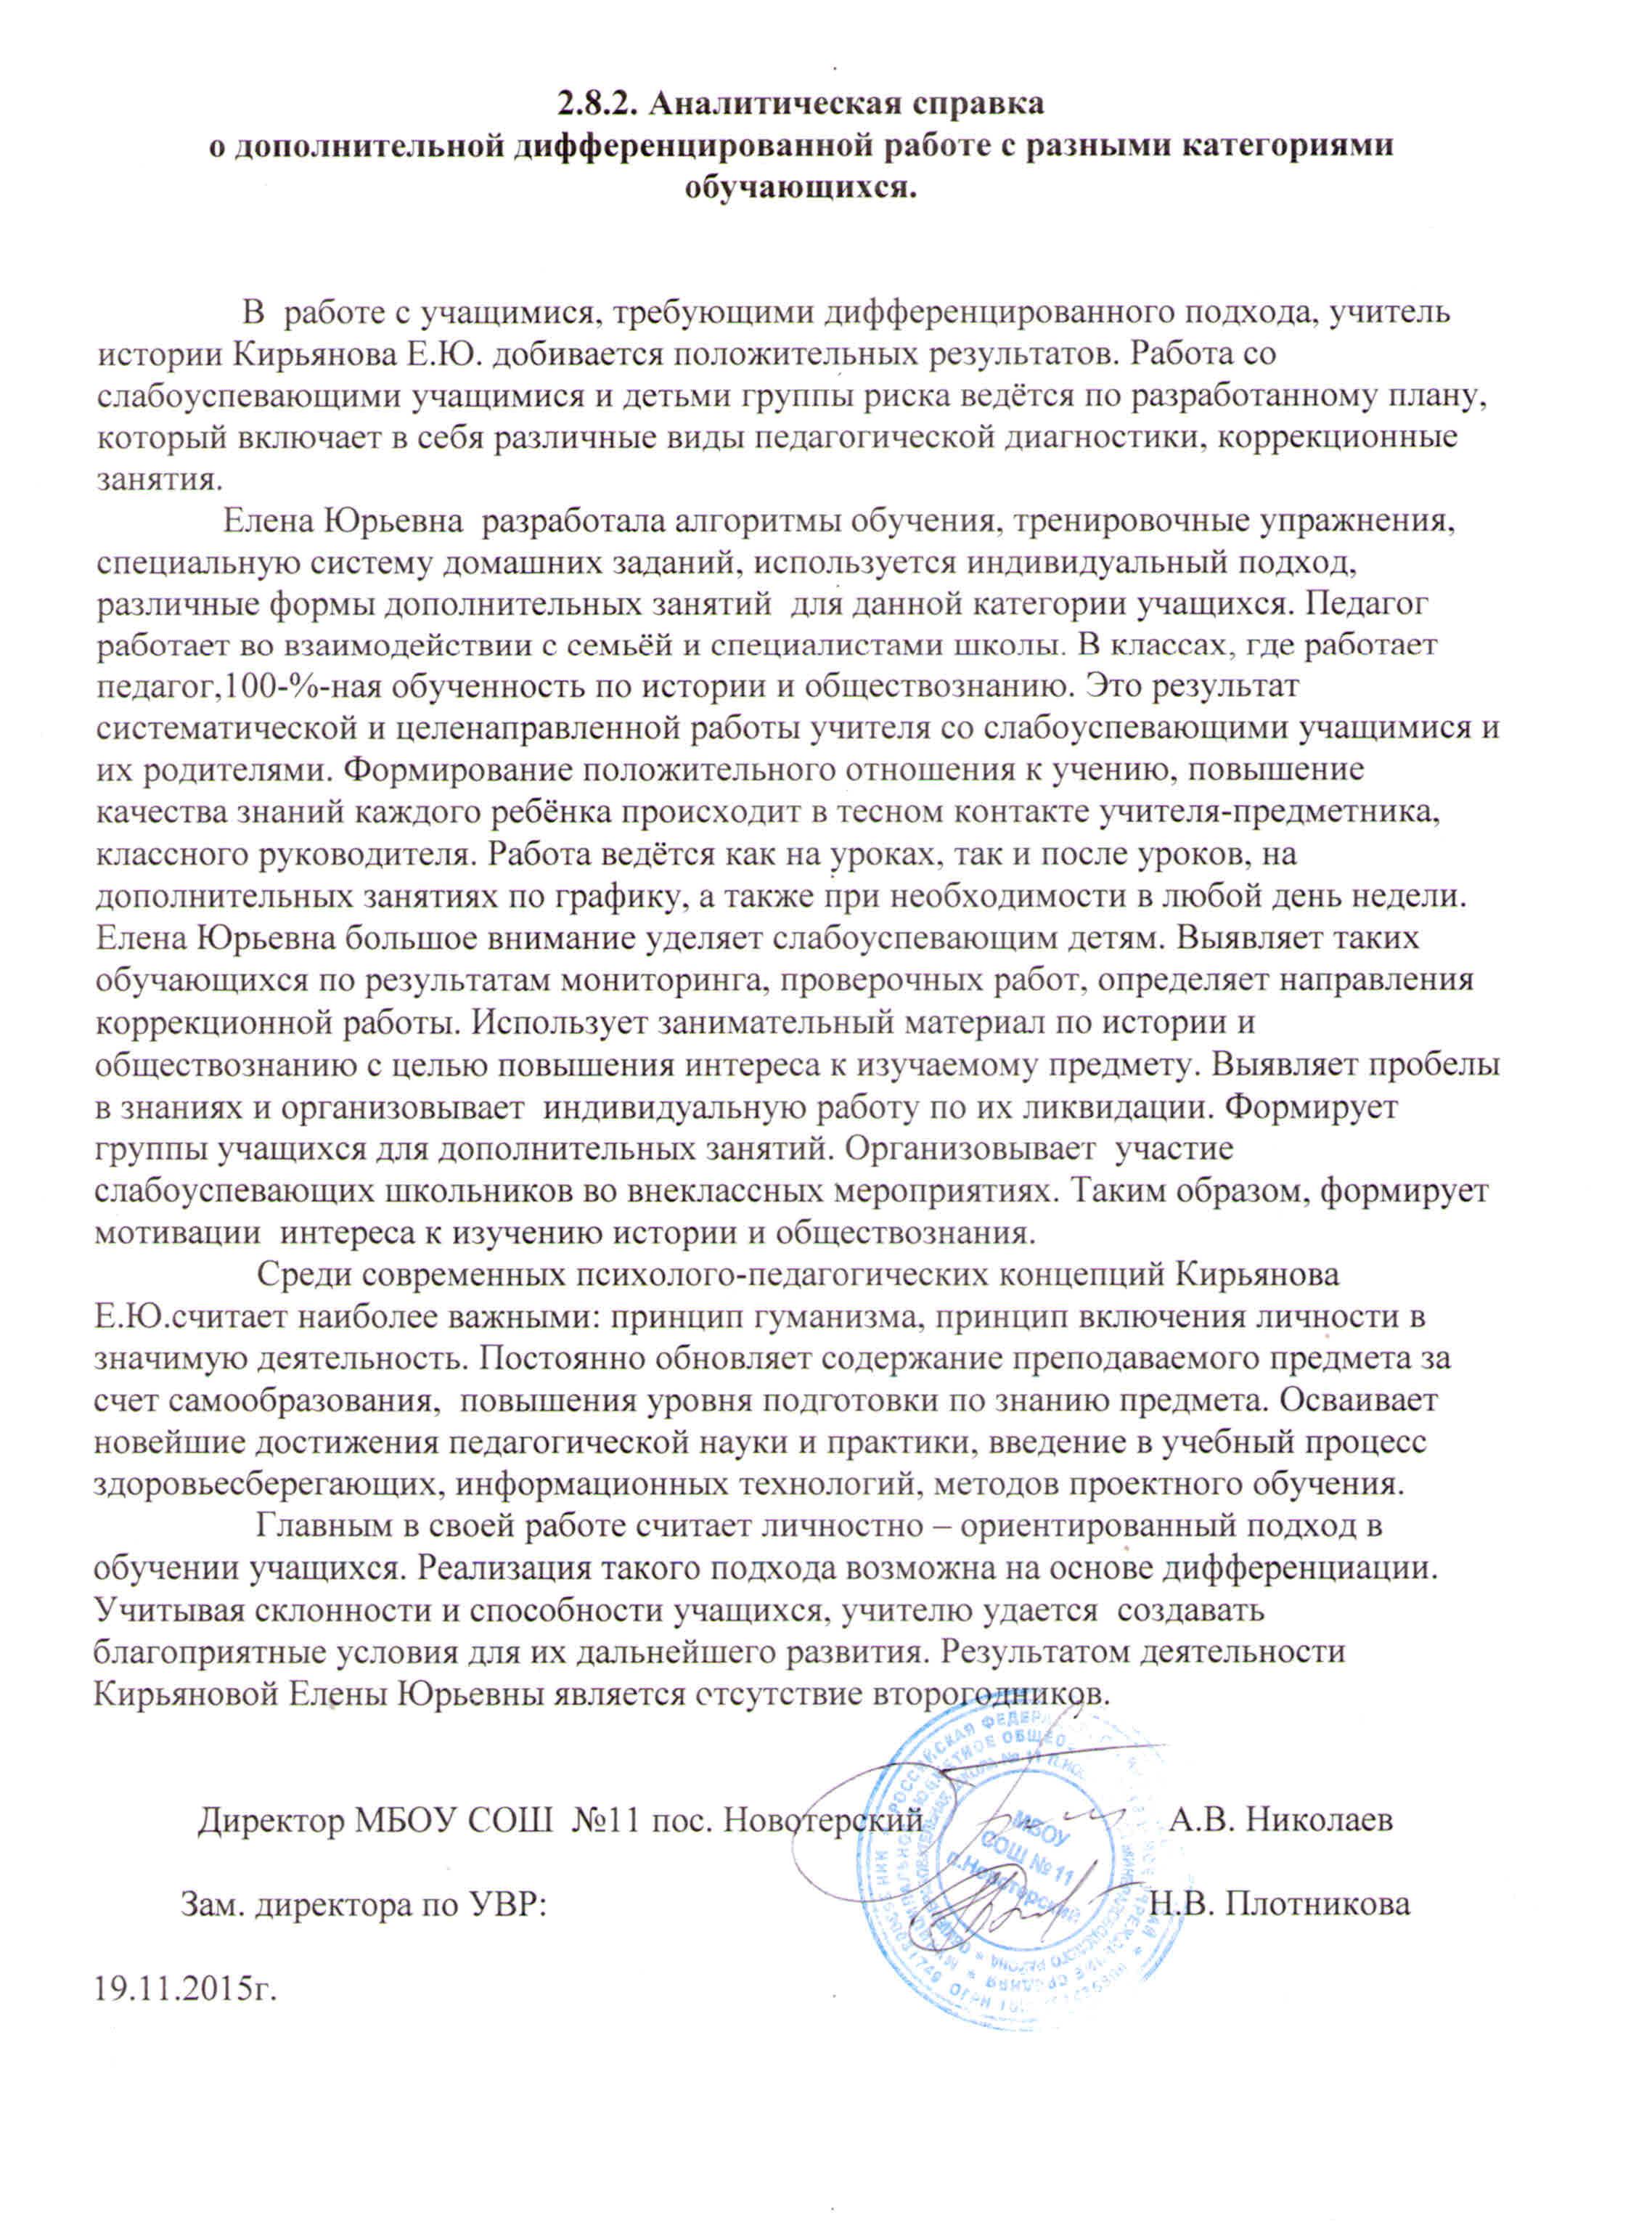 C:\Users\Сергей\Desktop\аналитсправка\Document_18.jpg